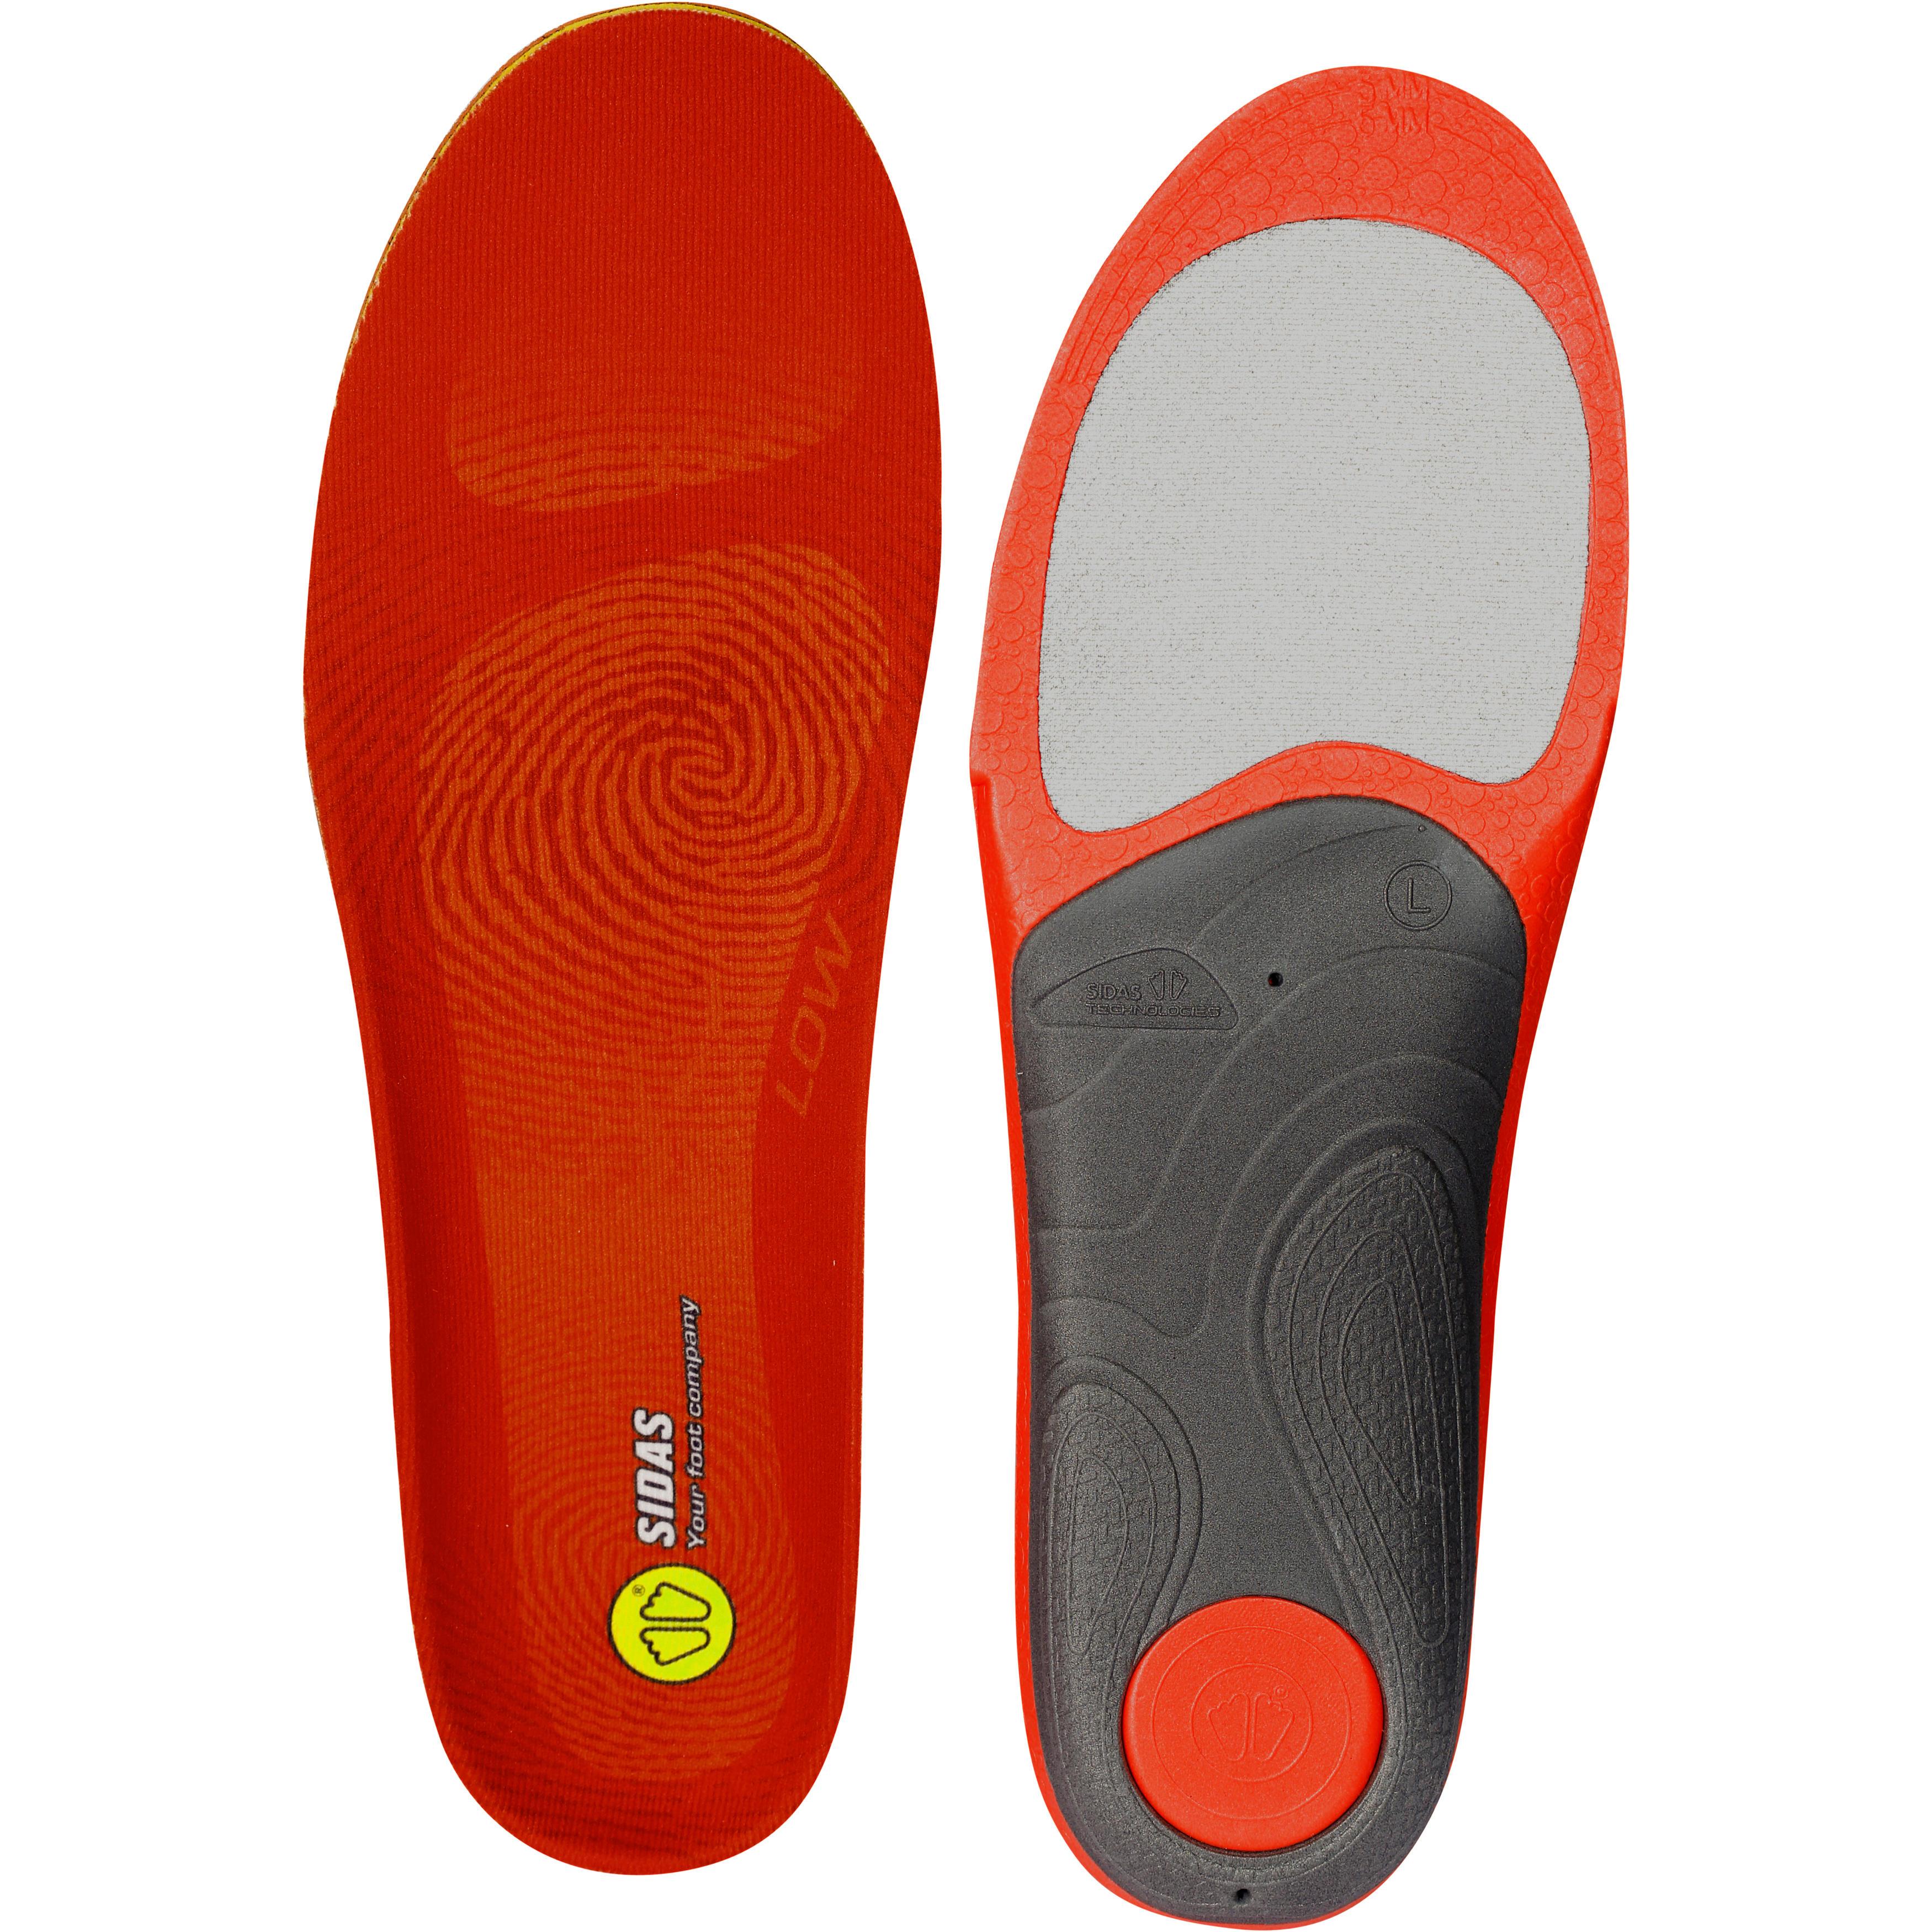 Sidas Semelles chaussures de ski pour pieds plats - Sidas